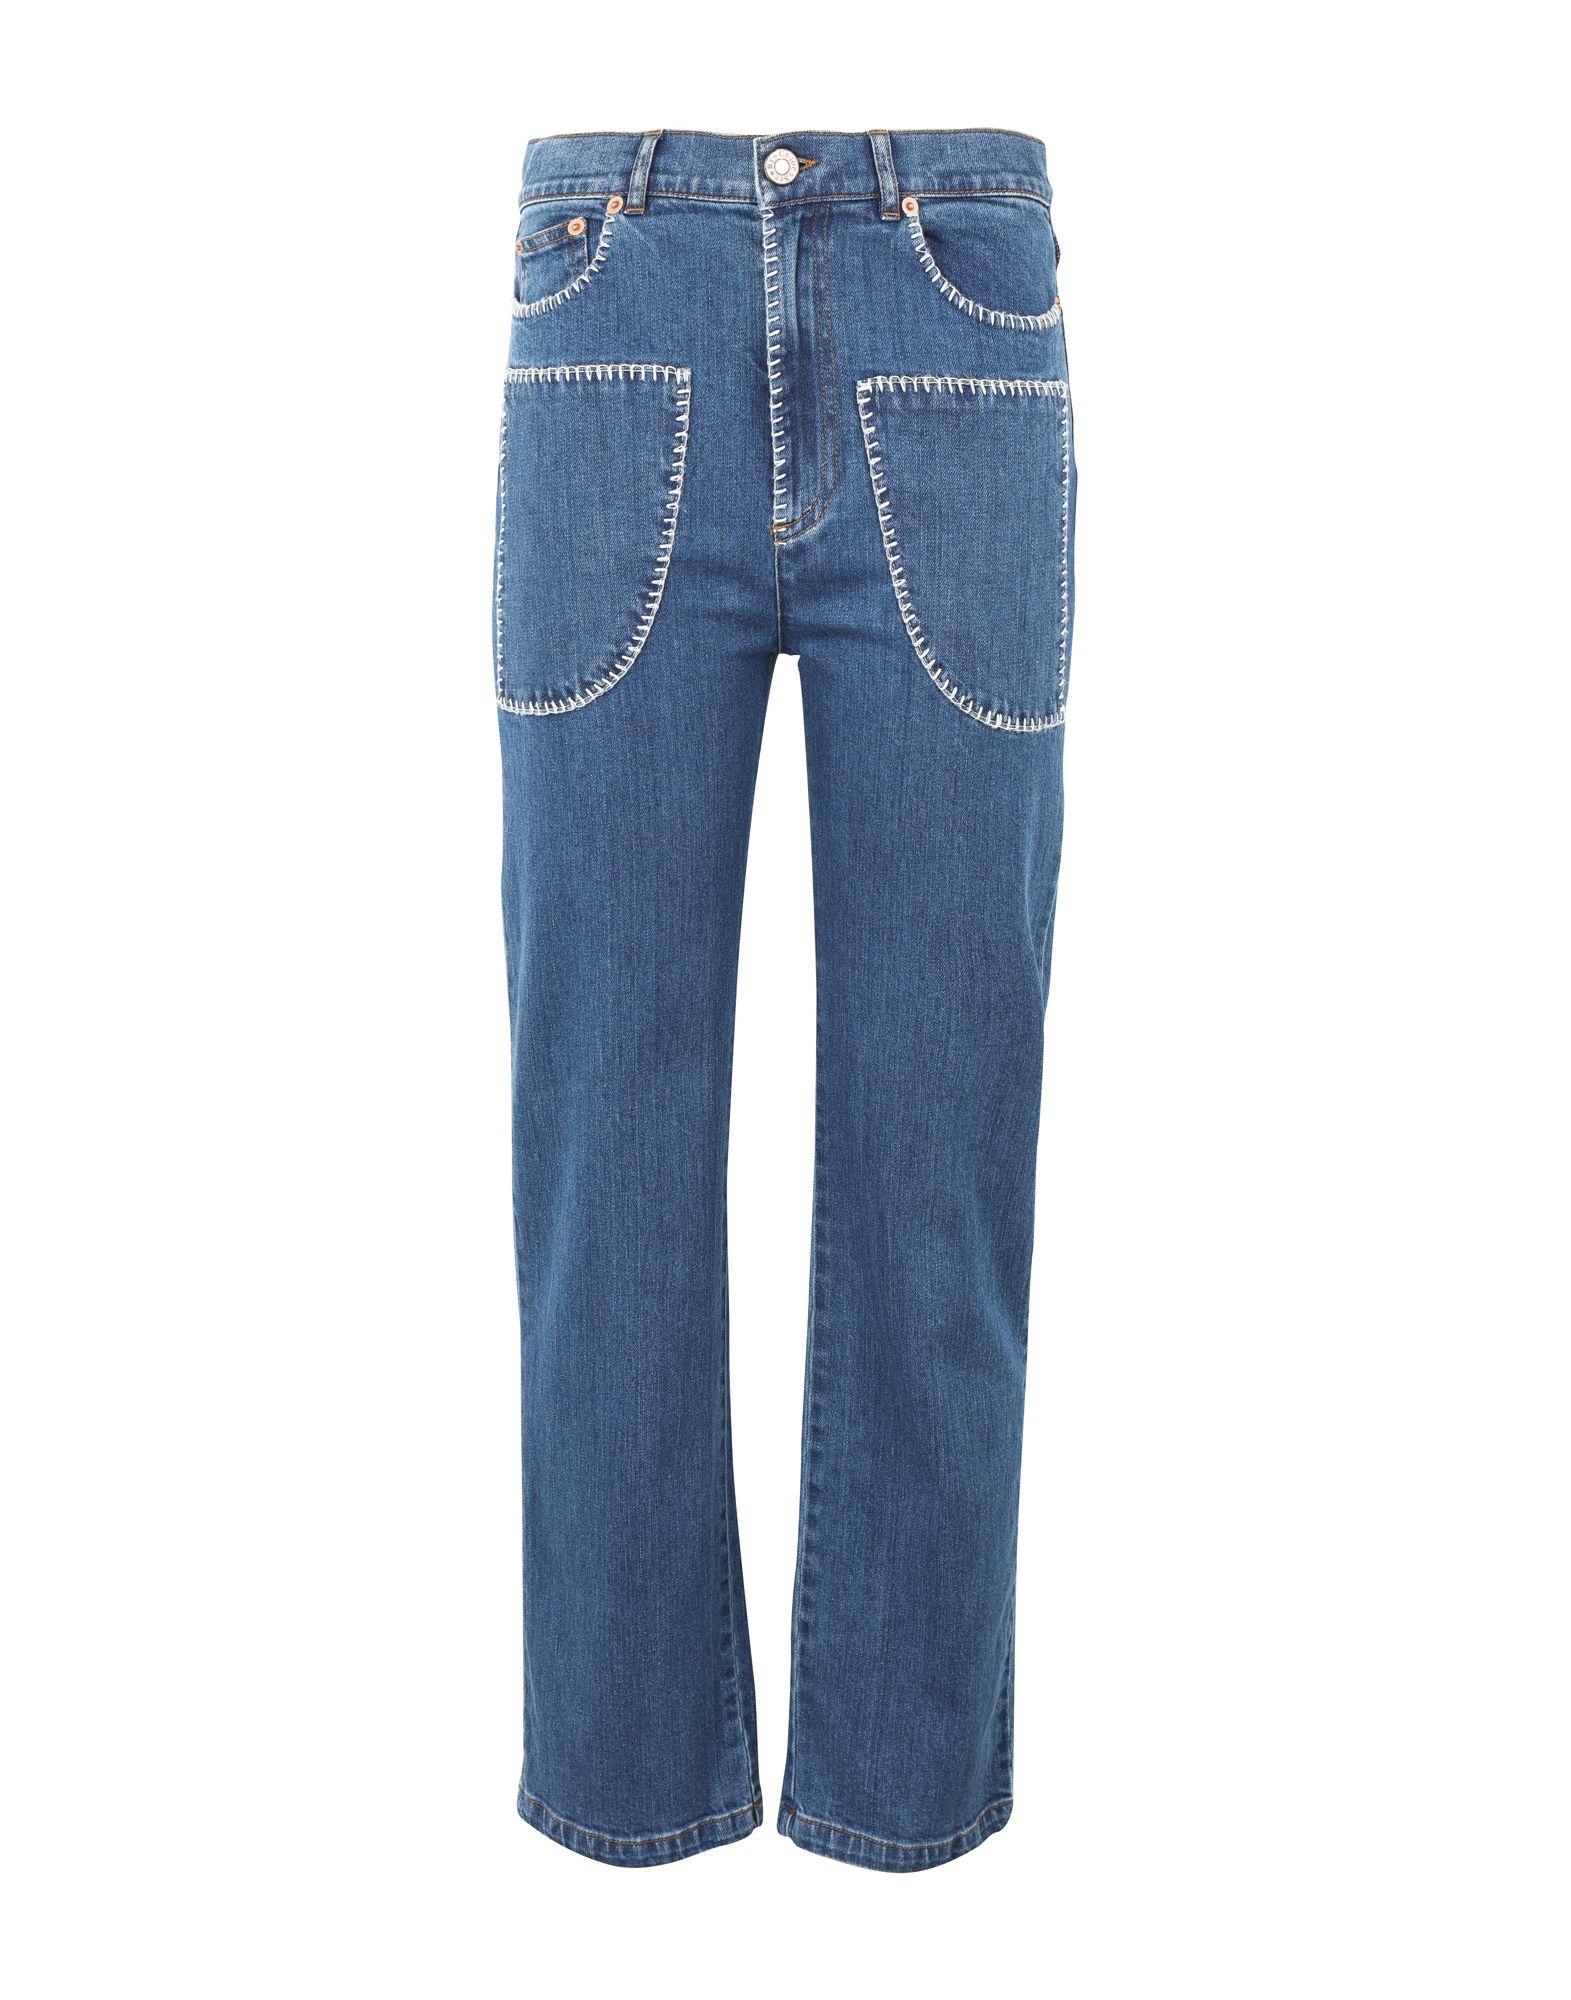 Фото - SEE BY CHLOÉ Джинсовые брюки see by chloé джинсовые брюки